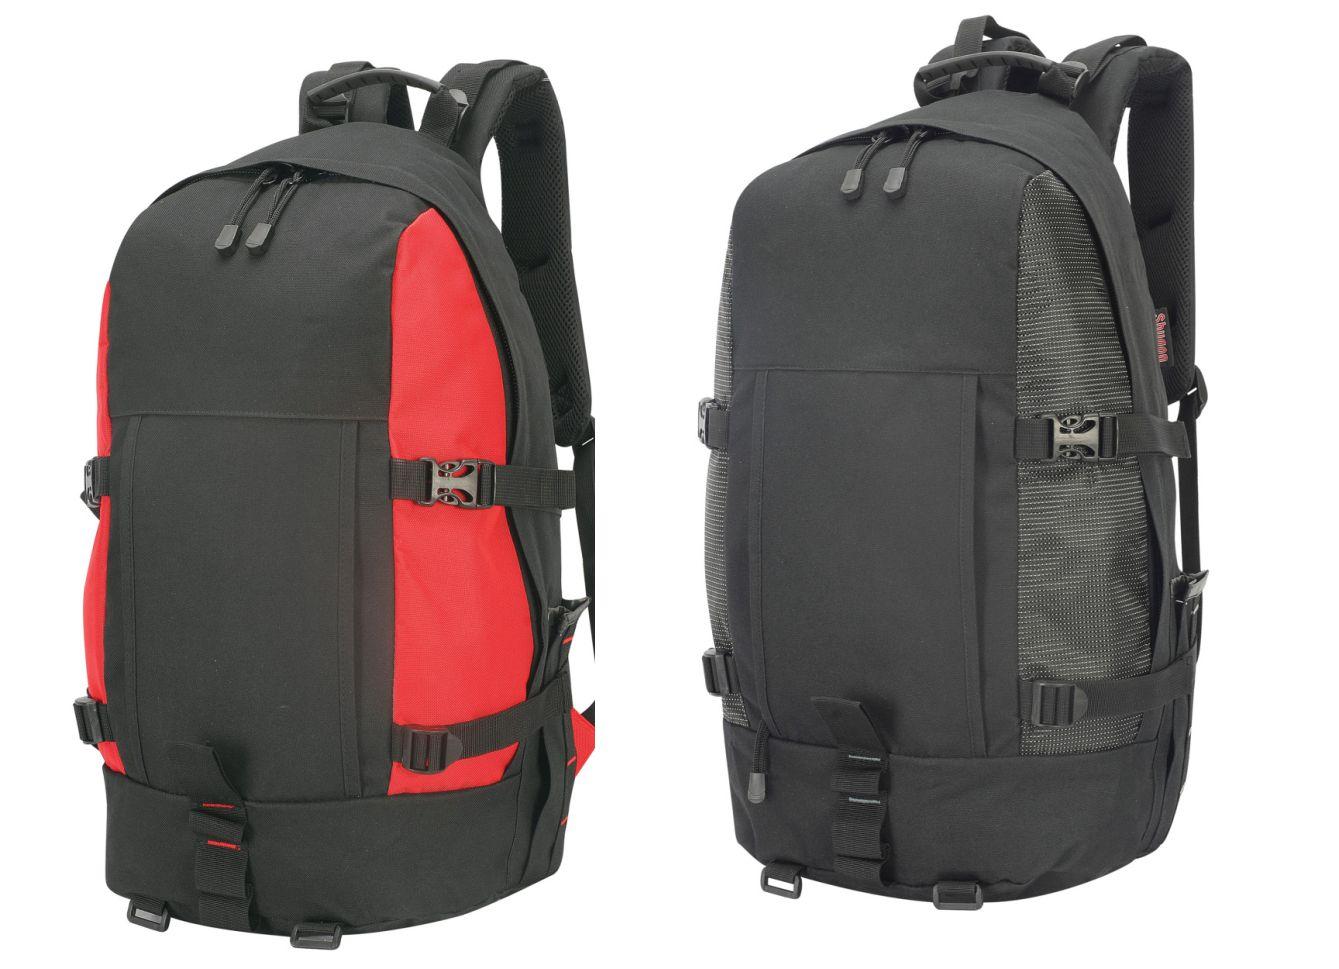 4db726893557 SH1788 Shugon Gran Paradiso 35 Hiker Backpack - £18.95 : Ark Trading ...